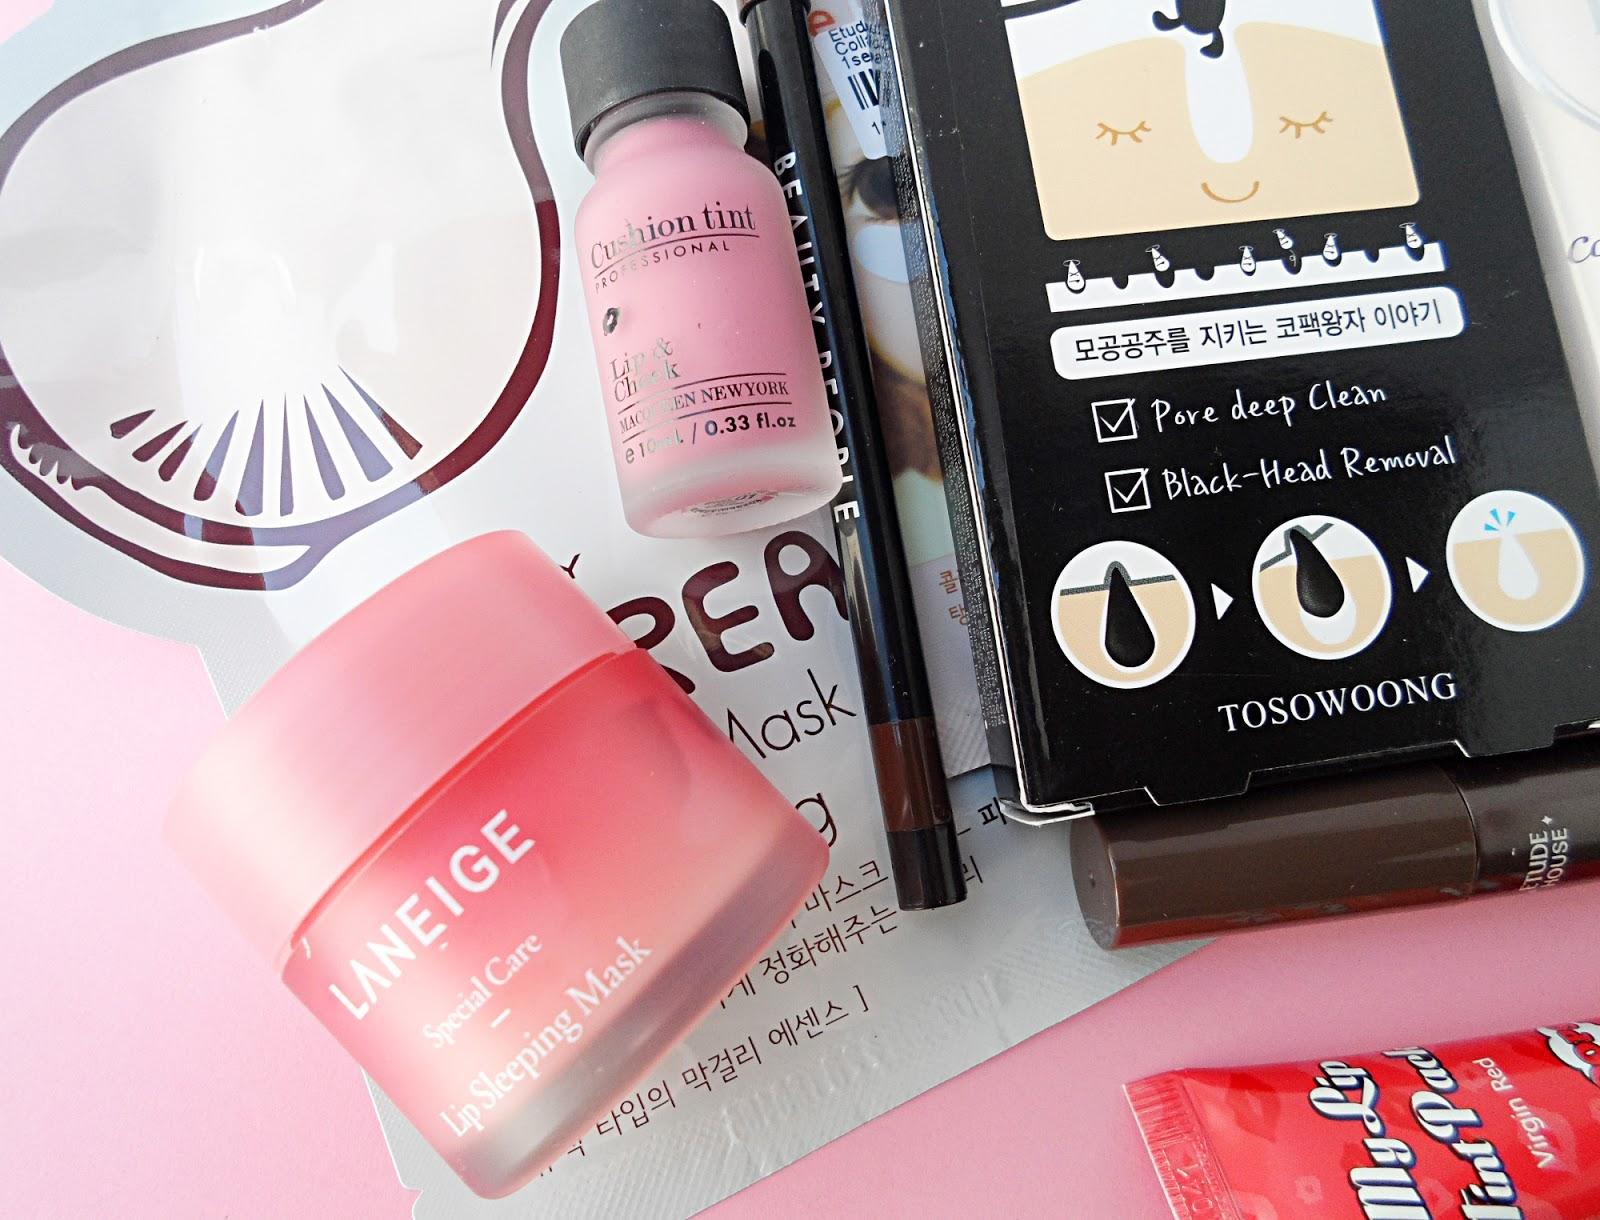 yesstyle korean beauty box blogger review liz breygel asian makeup skincare